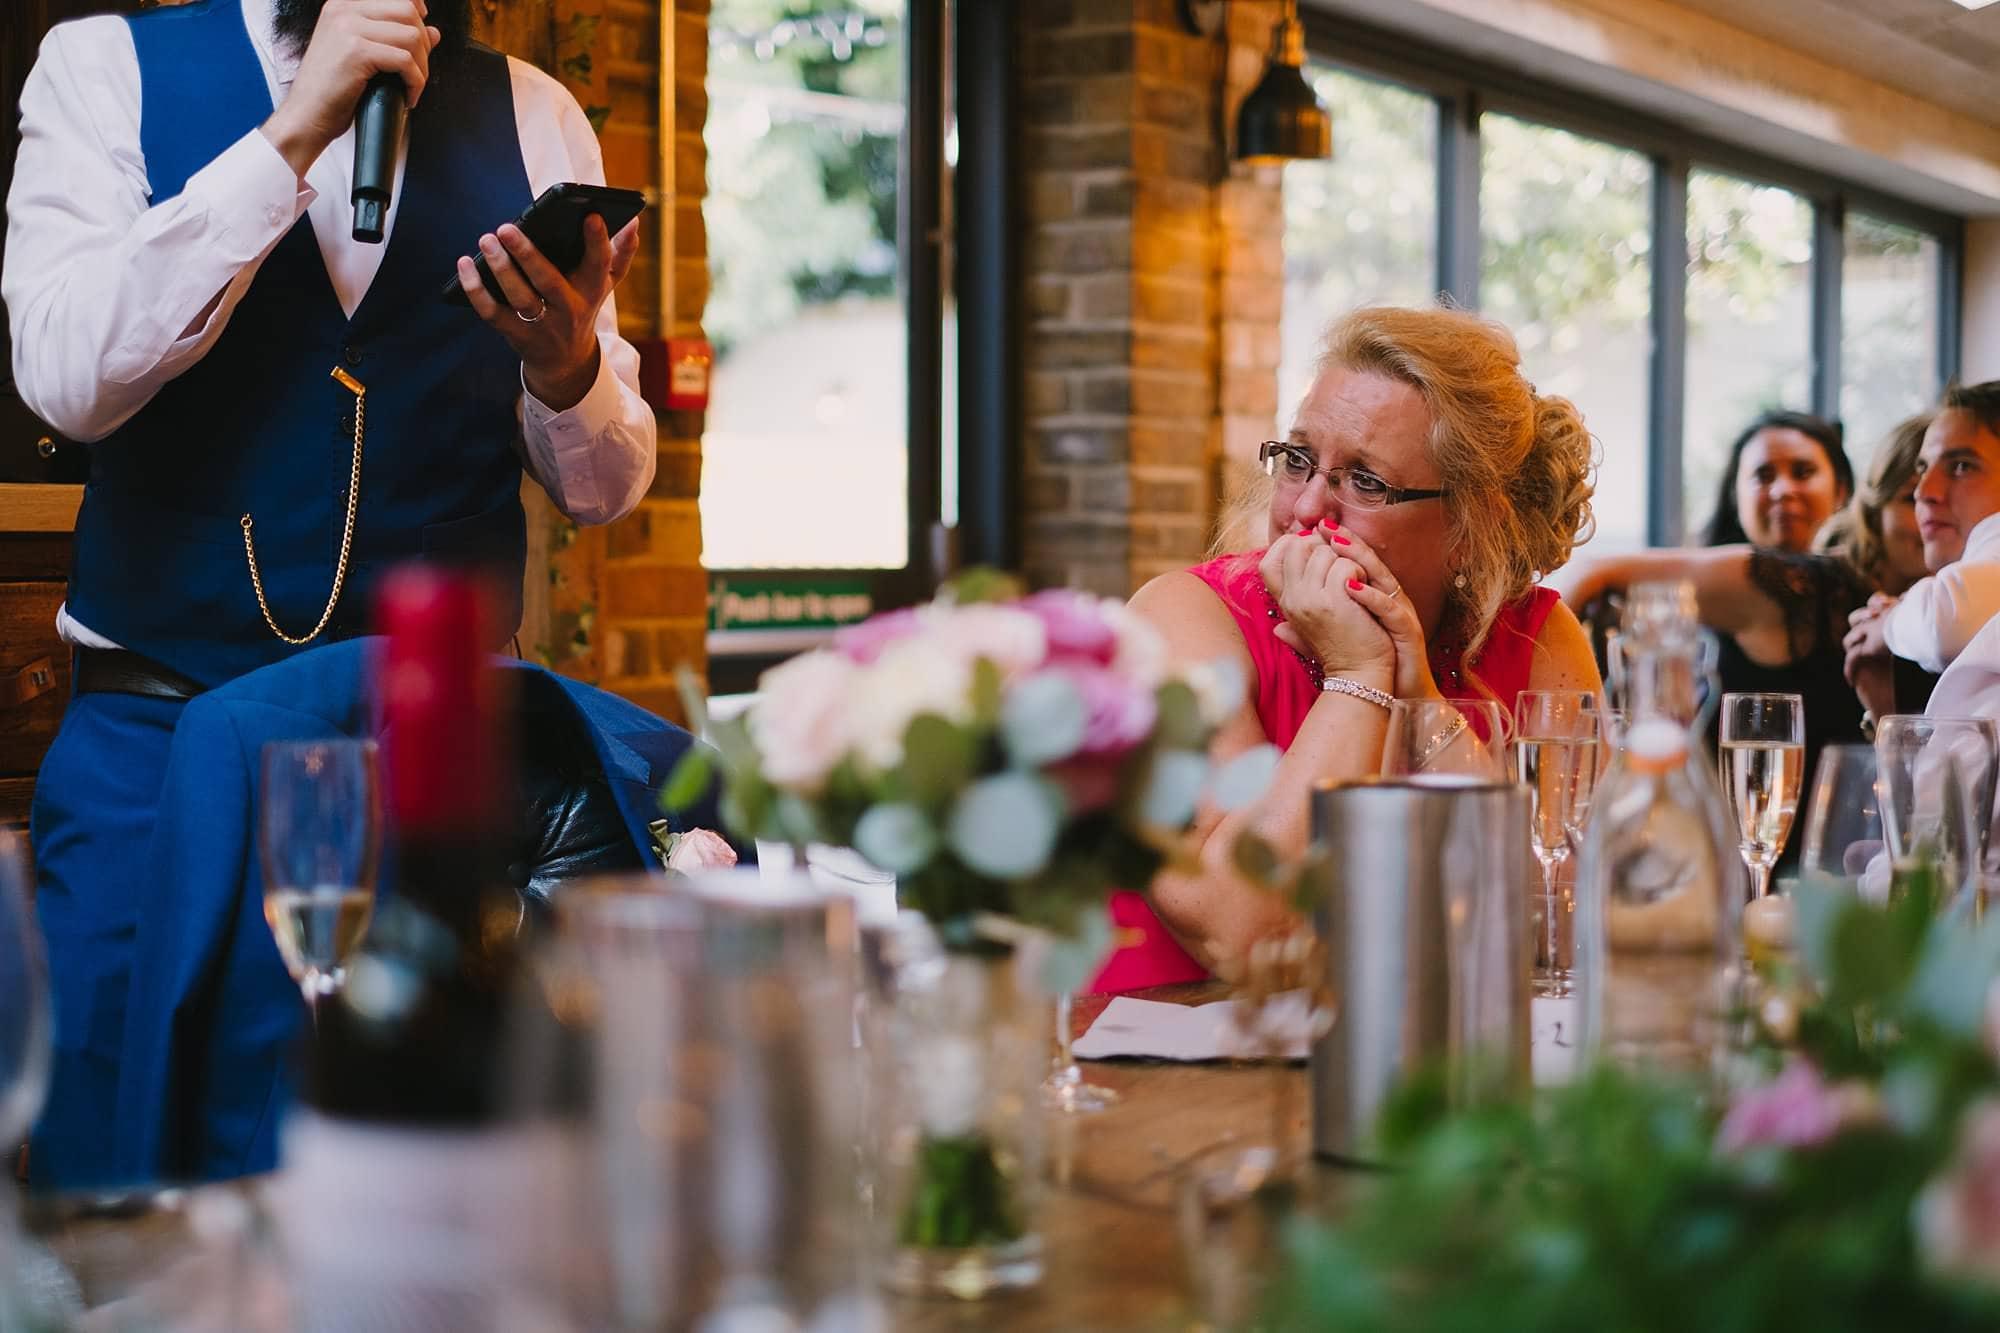 london pub wedding photographer jn 046 - The County Arms Wedding Photographer   Jen & Nick